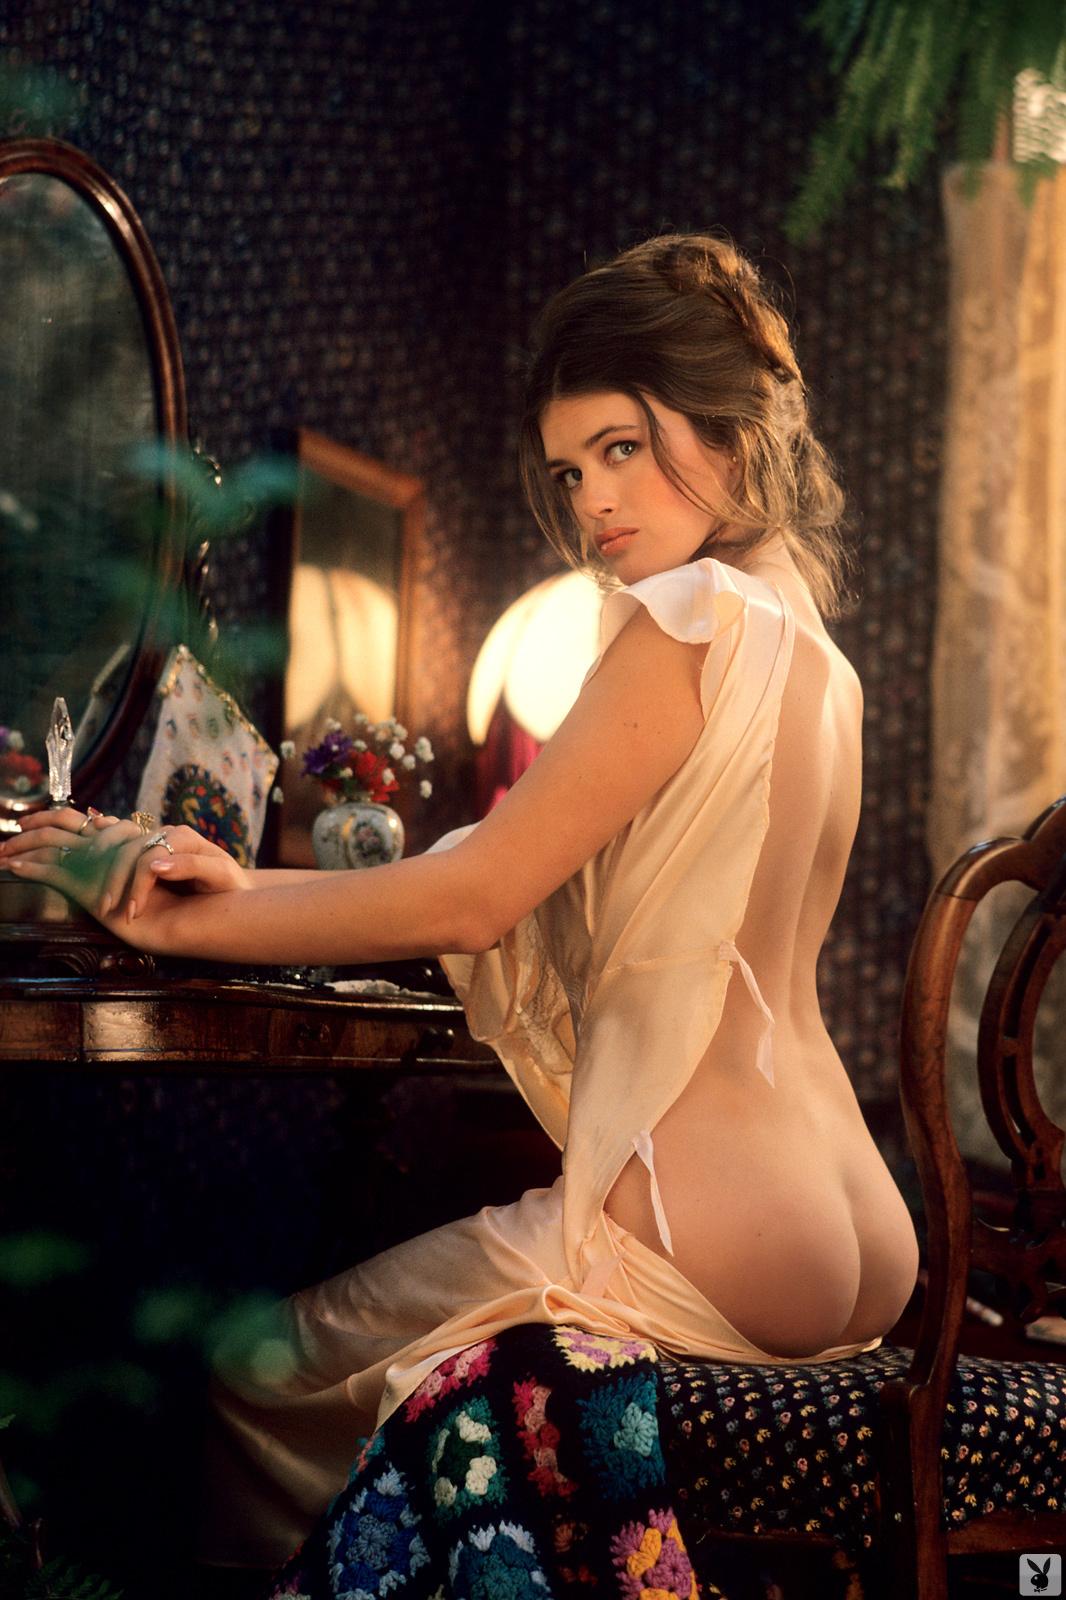 Jayne Naked jayne marie mansfield nude pictures. rating = 9.46/10